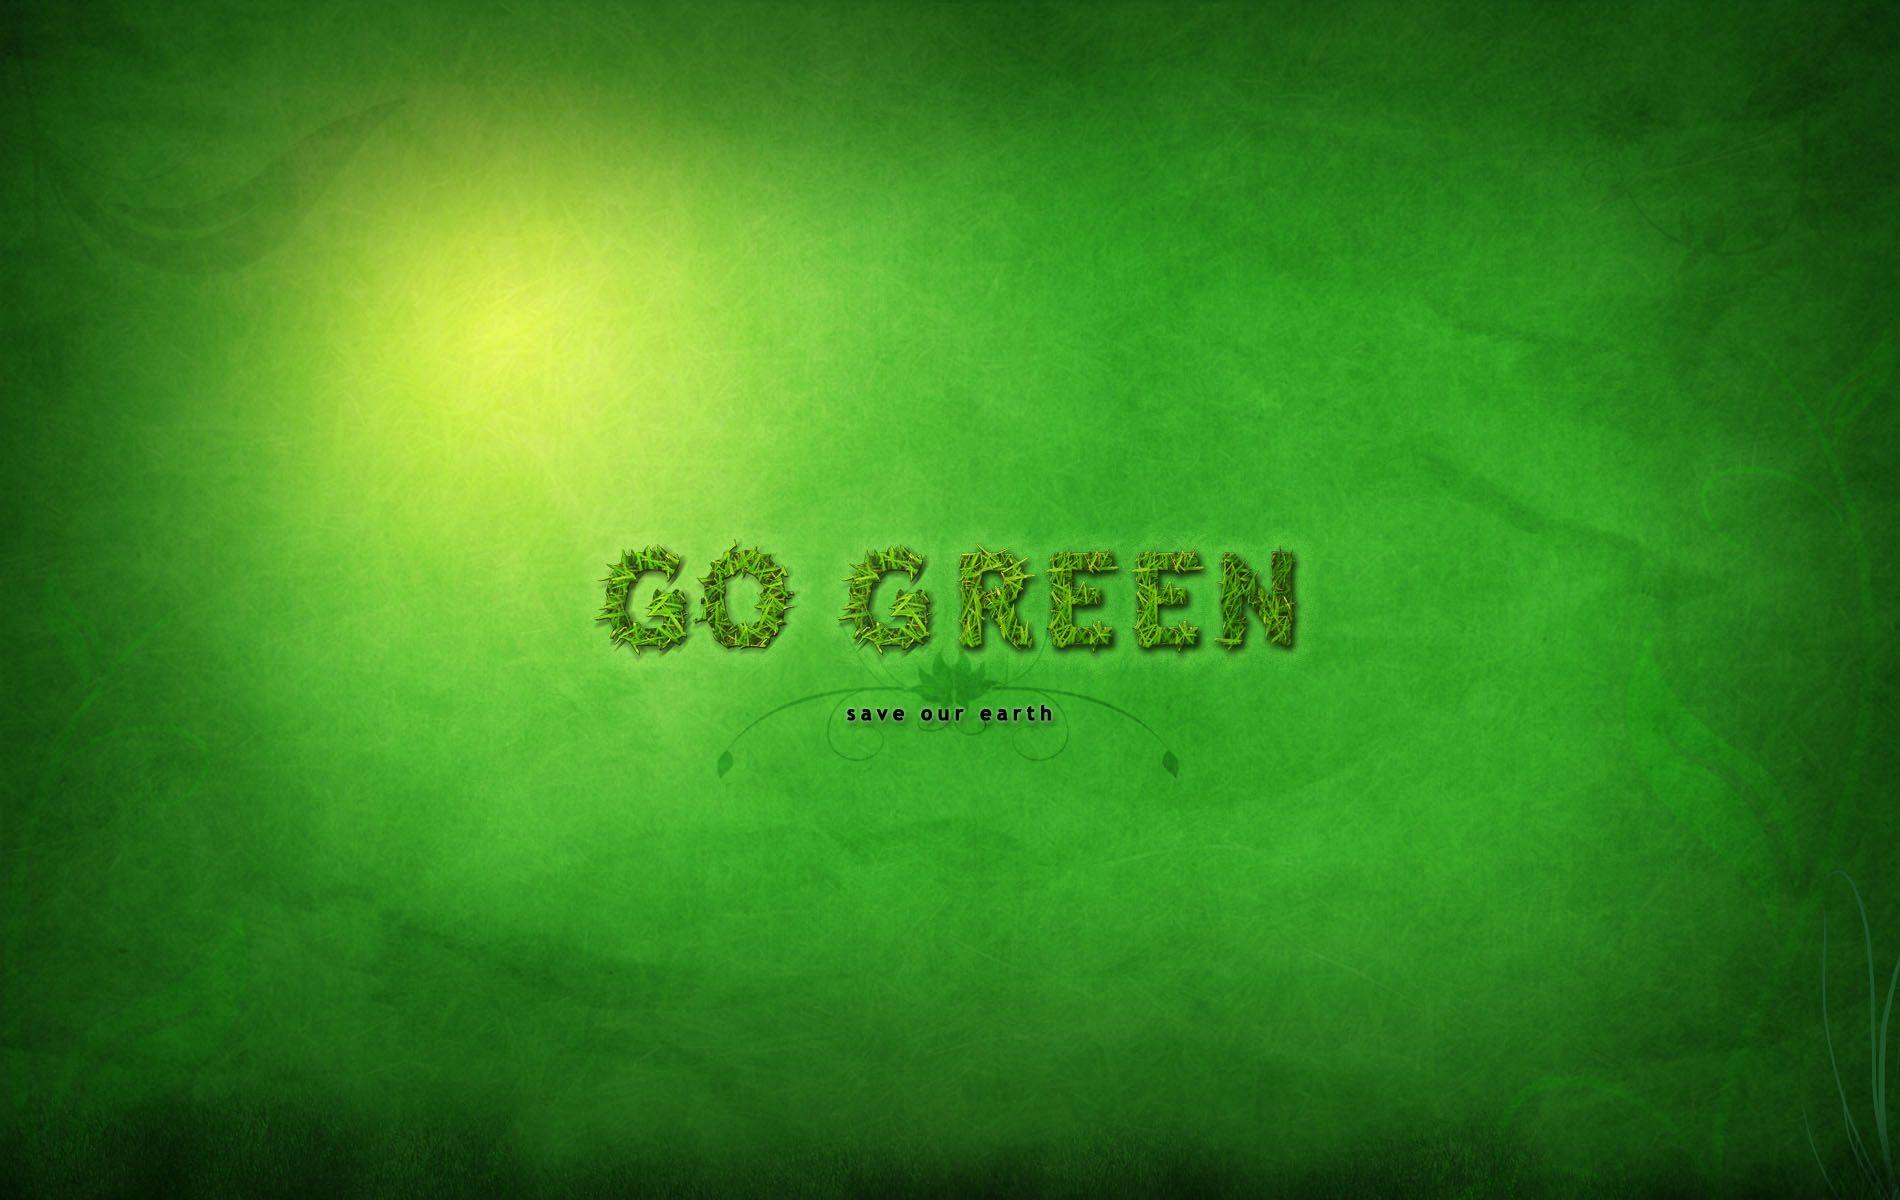 Go Green Wallpaper